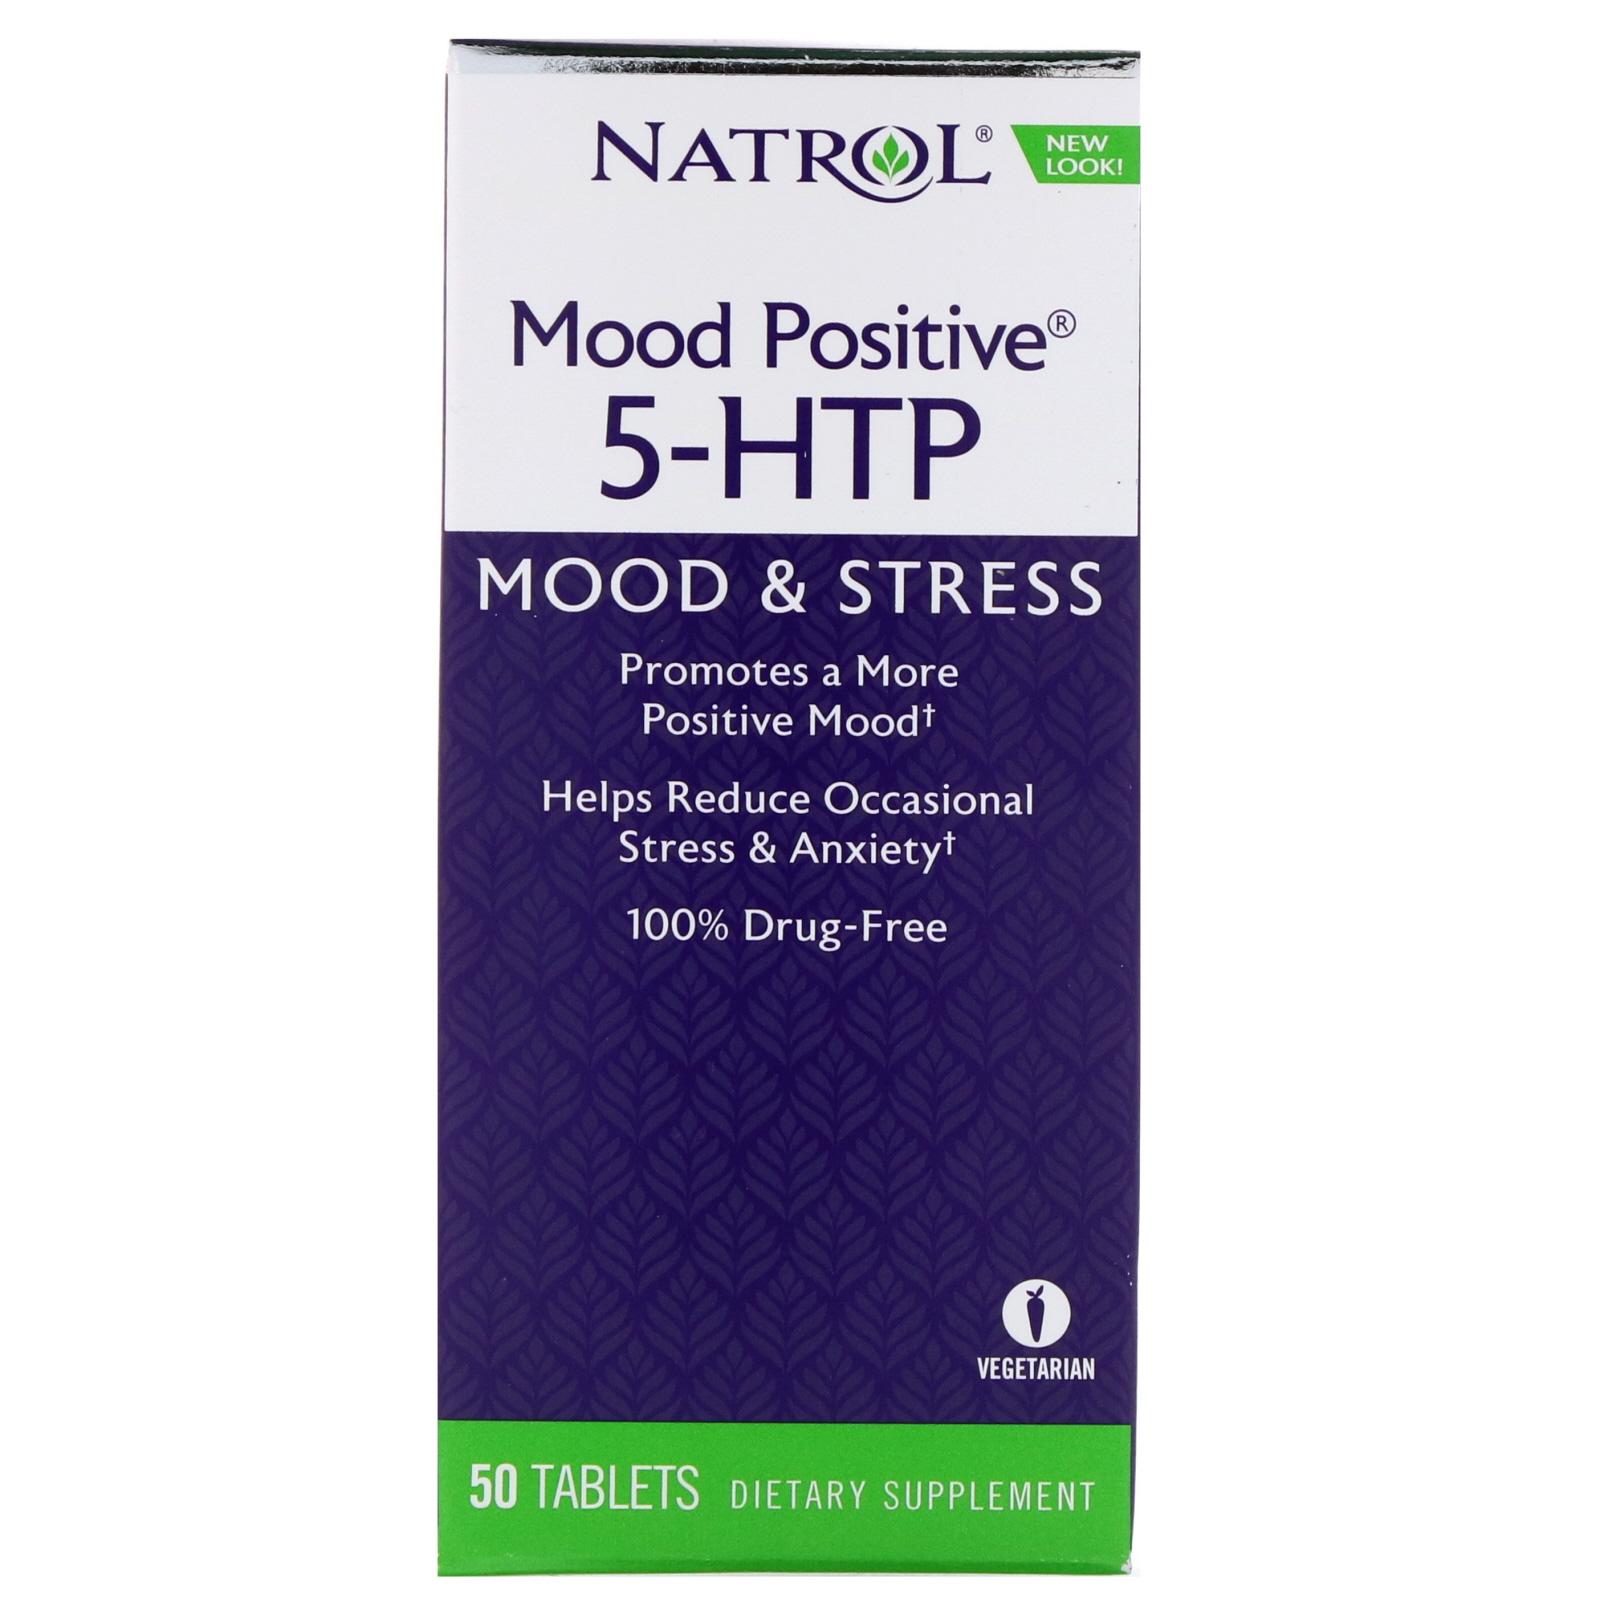 Natrol, Mood Positive 5-HTP, 50 Tablets